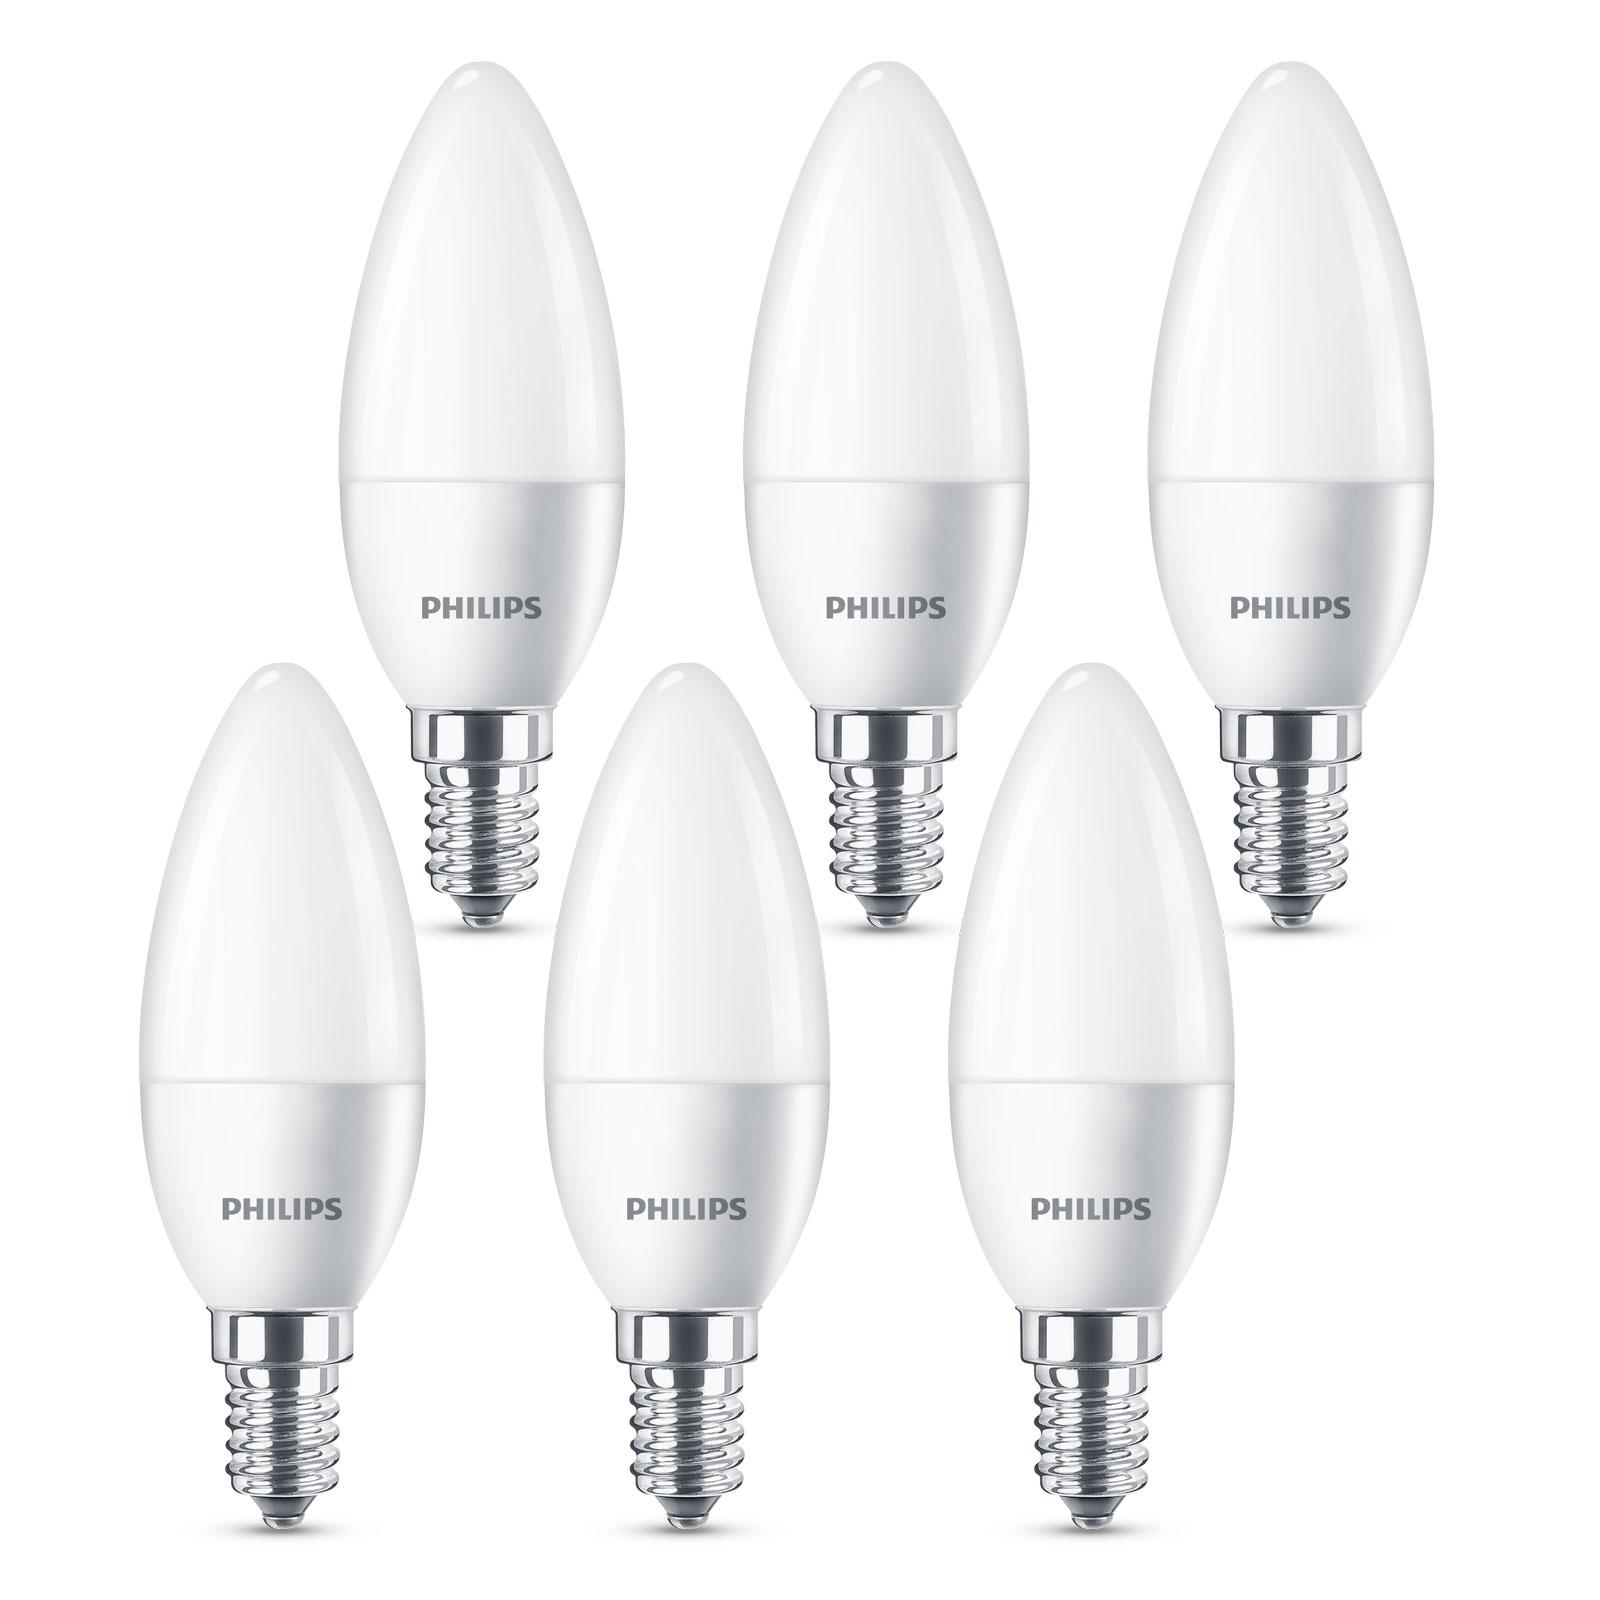 Philips LED-lampa E14 B35 5,5W matt 6-pack